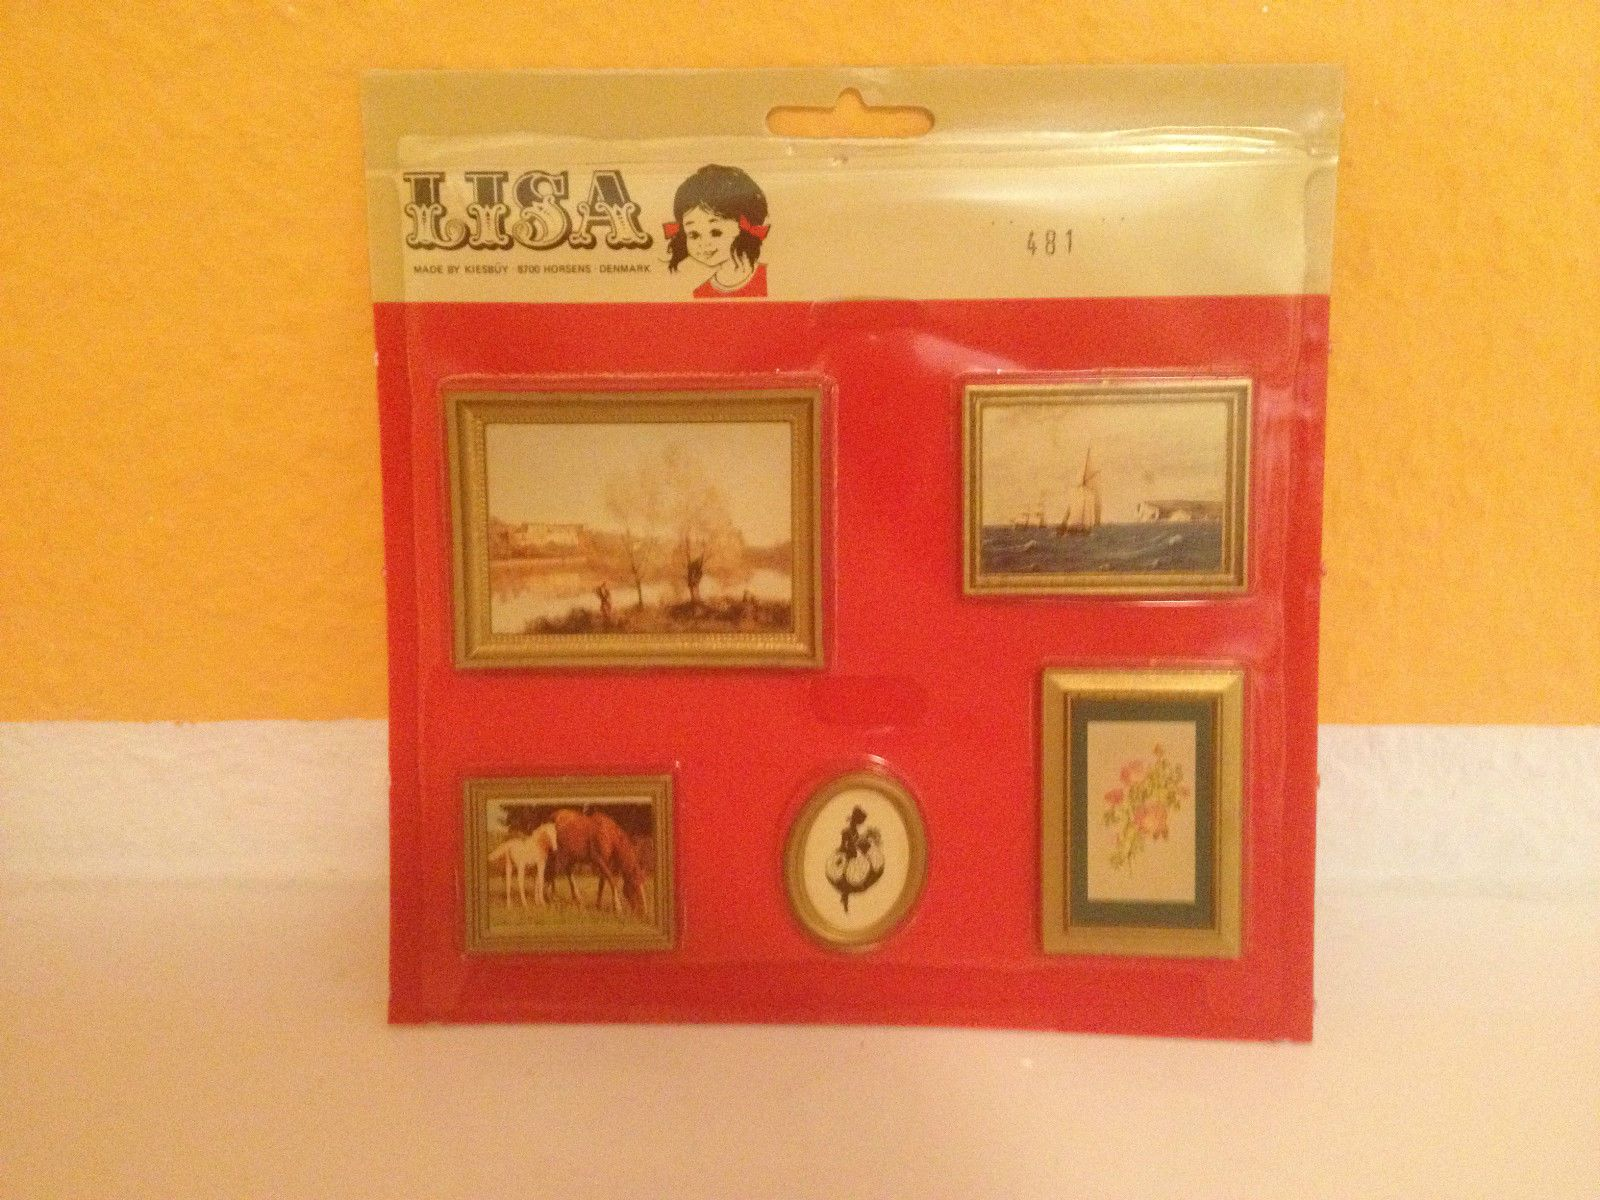 Lisa Bilder Set Gemälde Puppenstube Puppenhaus Vintage New Neu mint ...